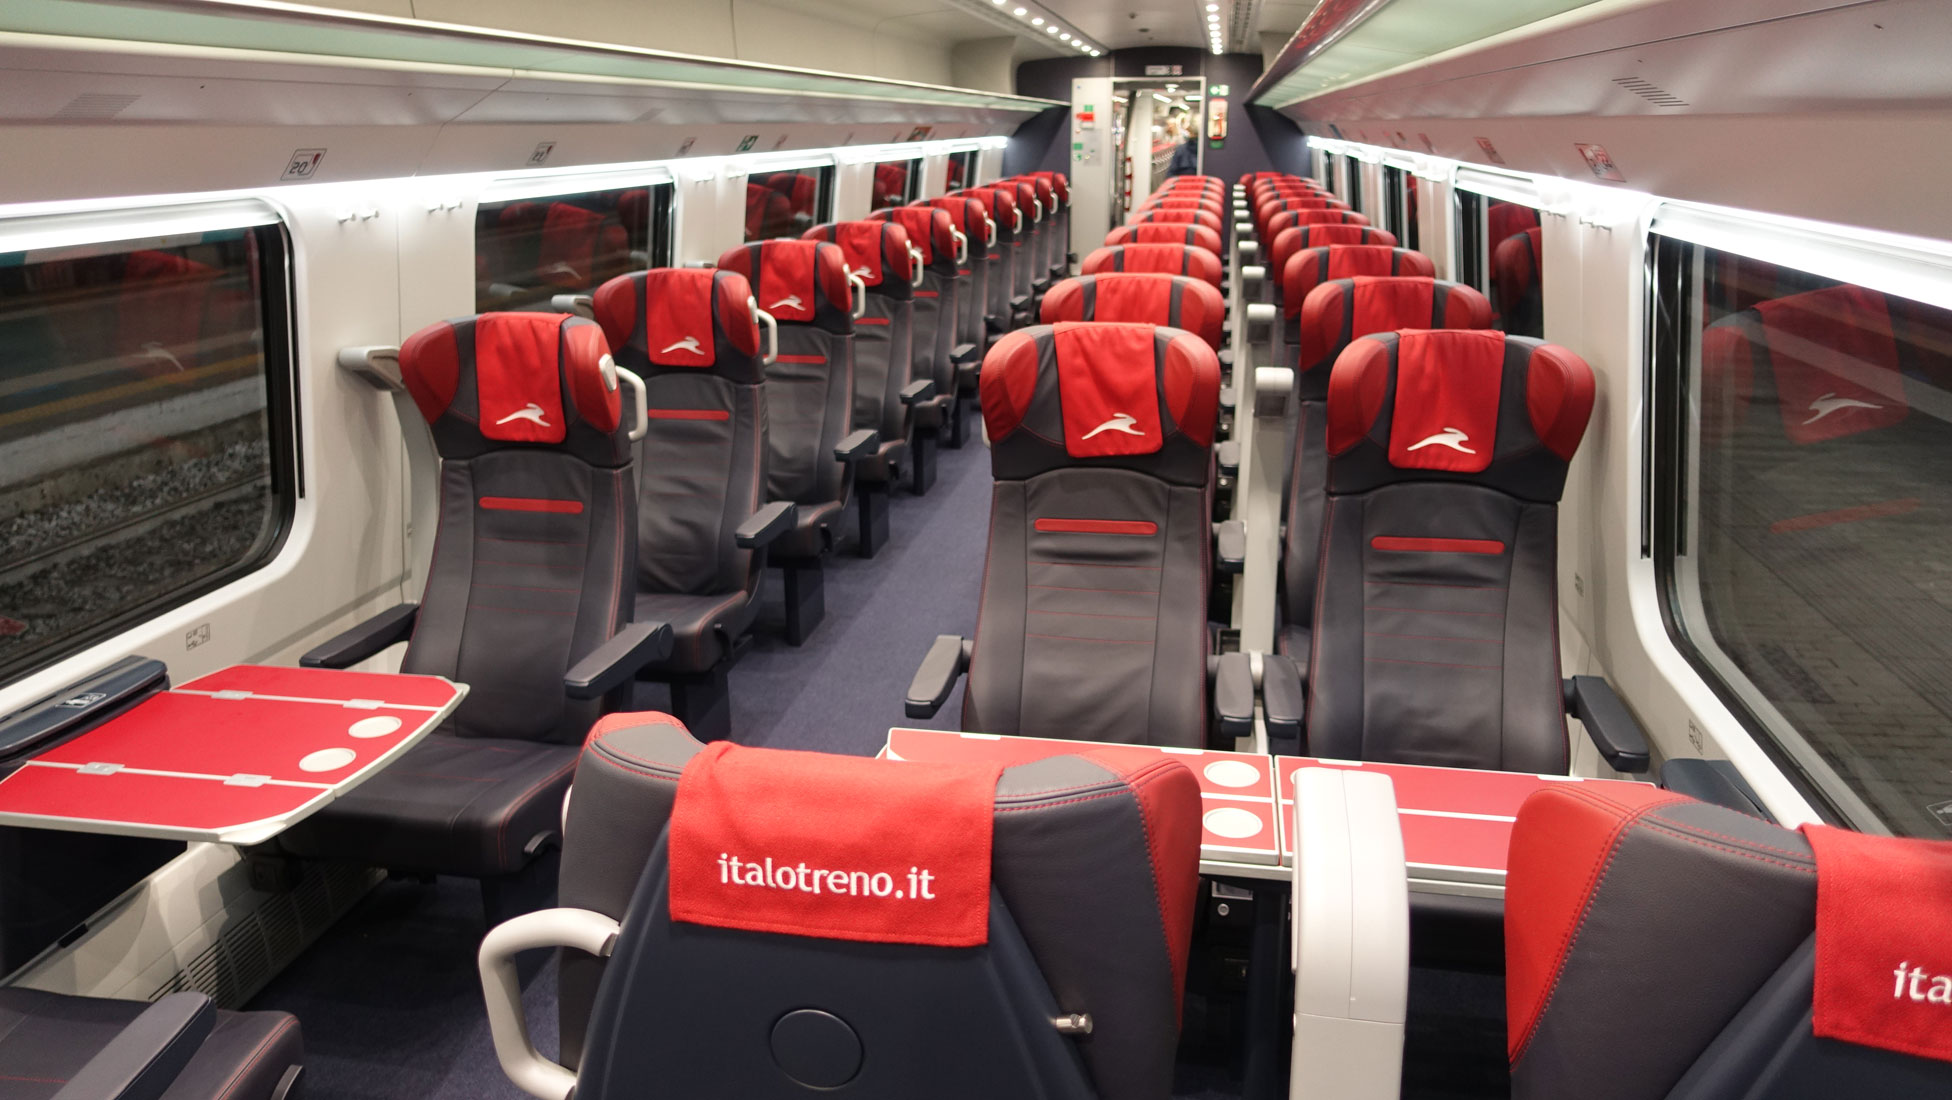 Brilliant Italo Trains Italo Tickets From 15 Beatyapartments Chair Design Images Beatyapartmentscom